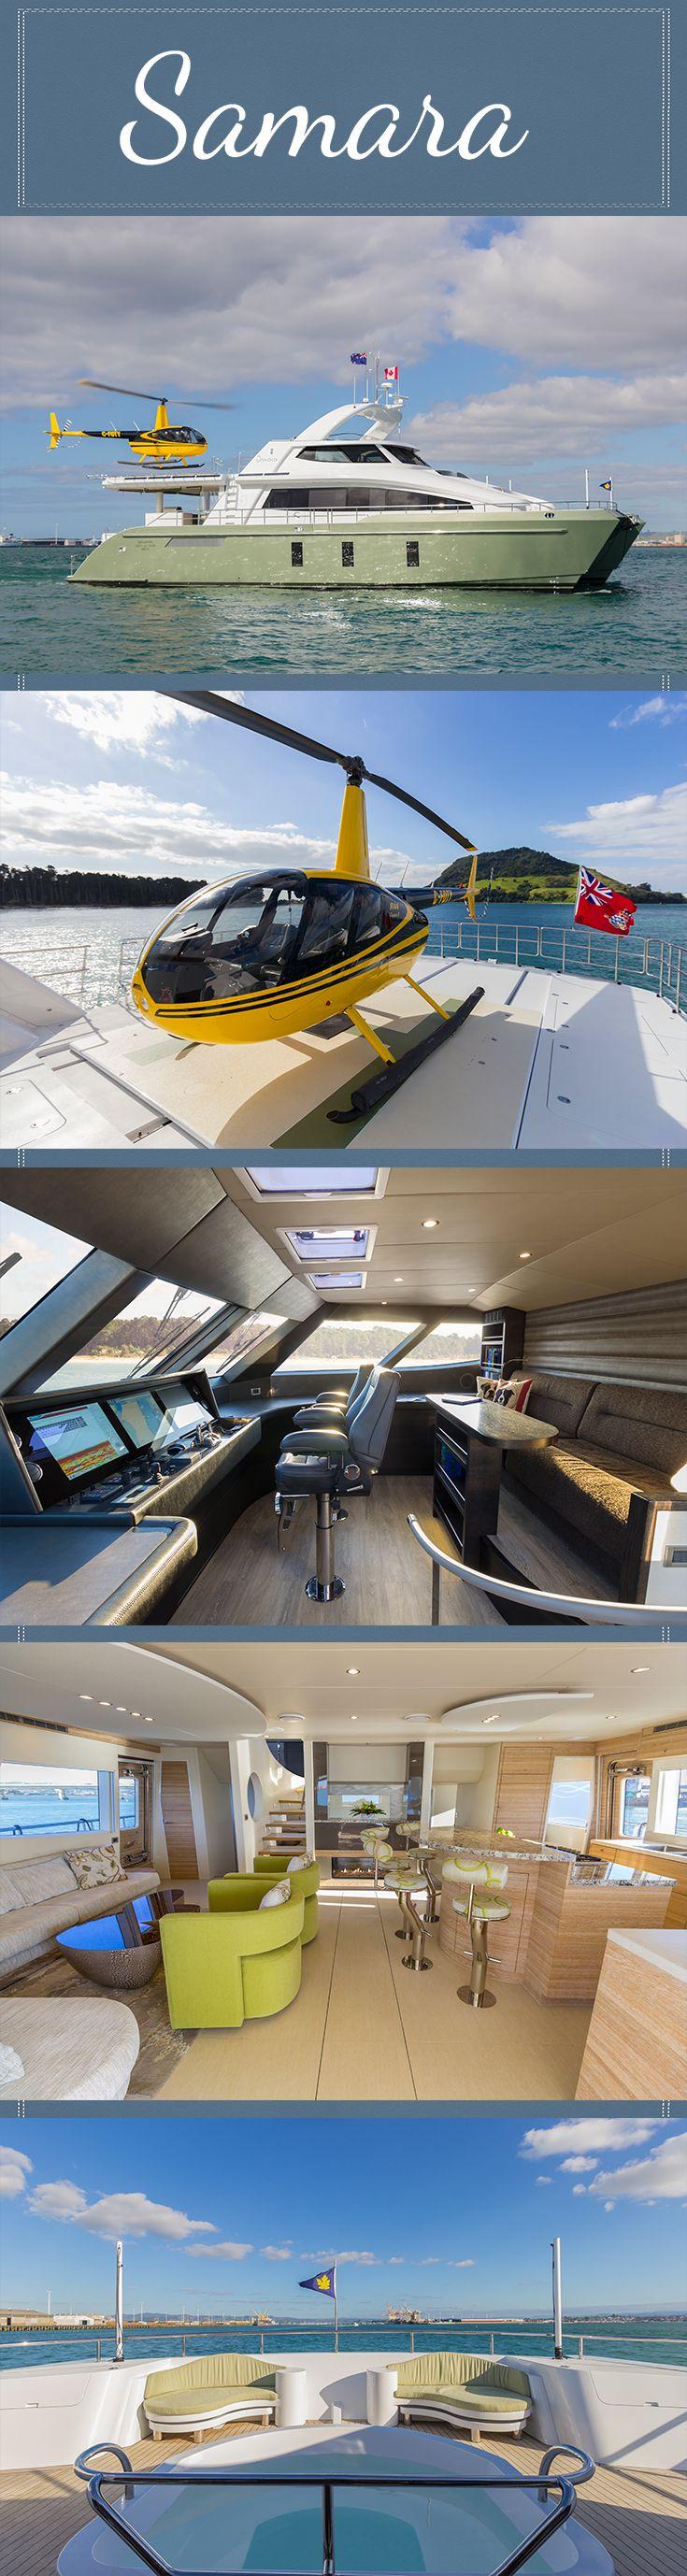 Pachoud Yachts 24m Exploration Catamaran Superyacht - Samara. Automated helideck, Helm, Saloon, Spa on foredeck